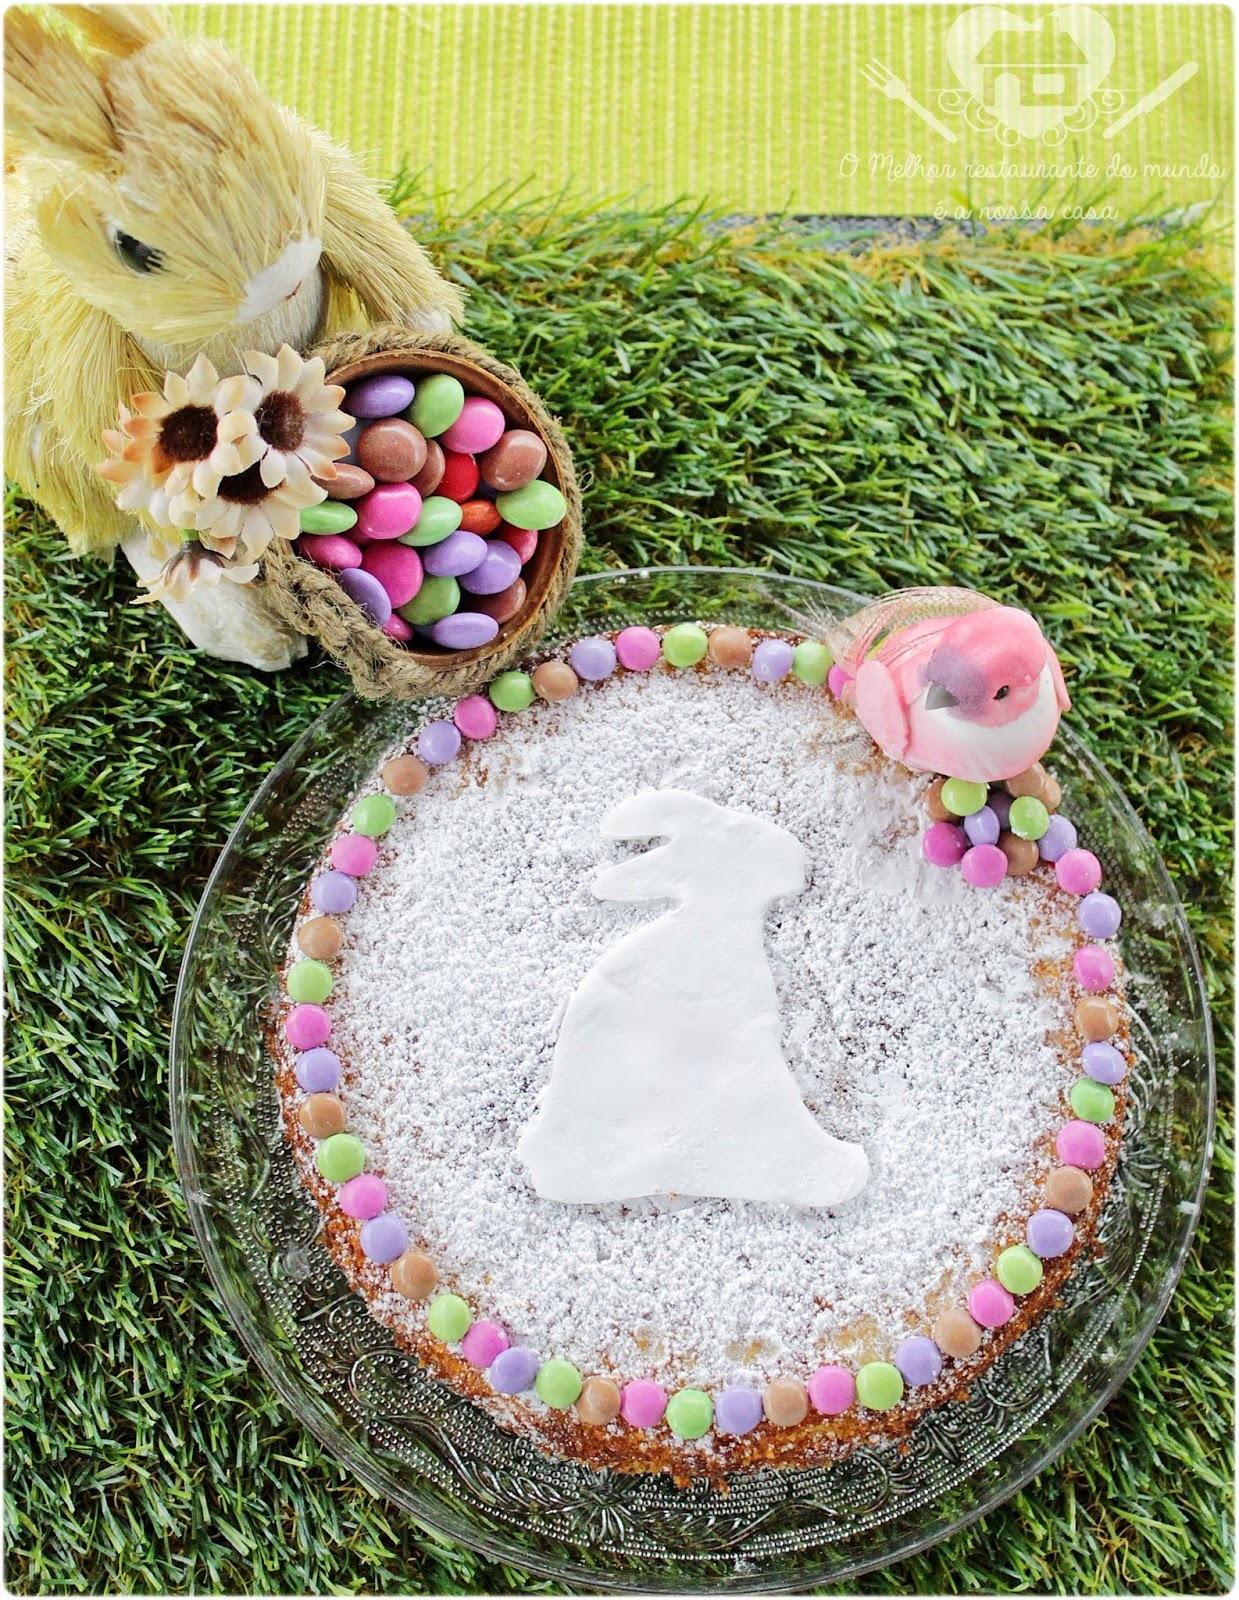 Bolo cítrico de amêndoas e polenta decorado para páscoa